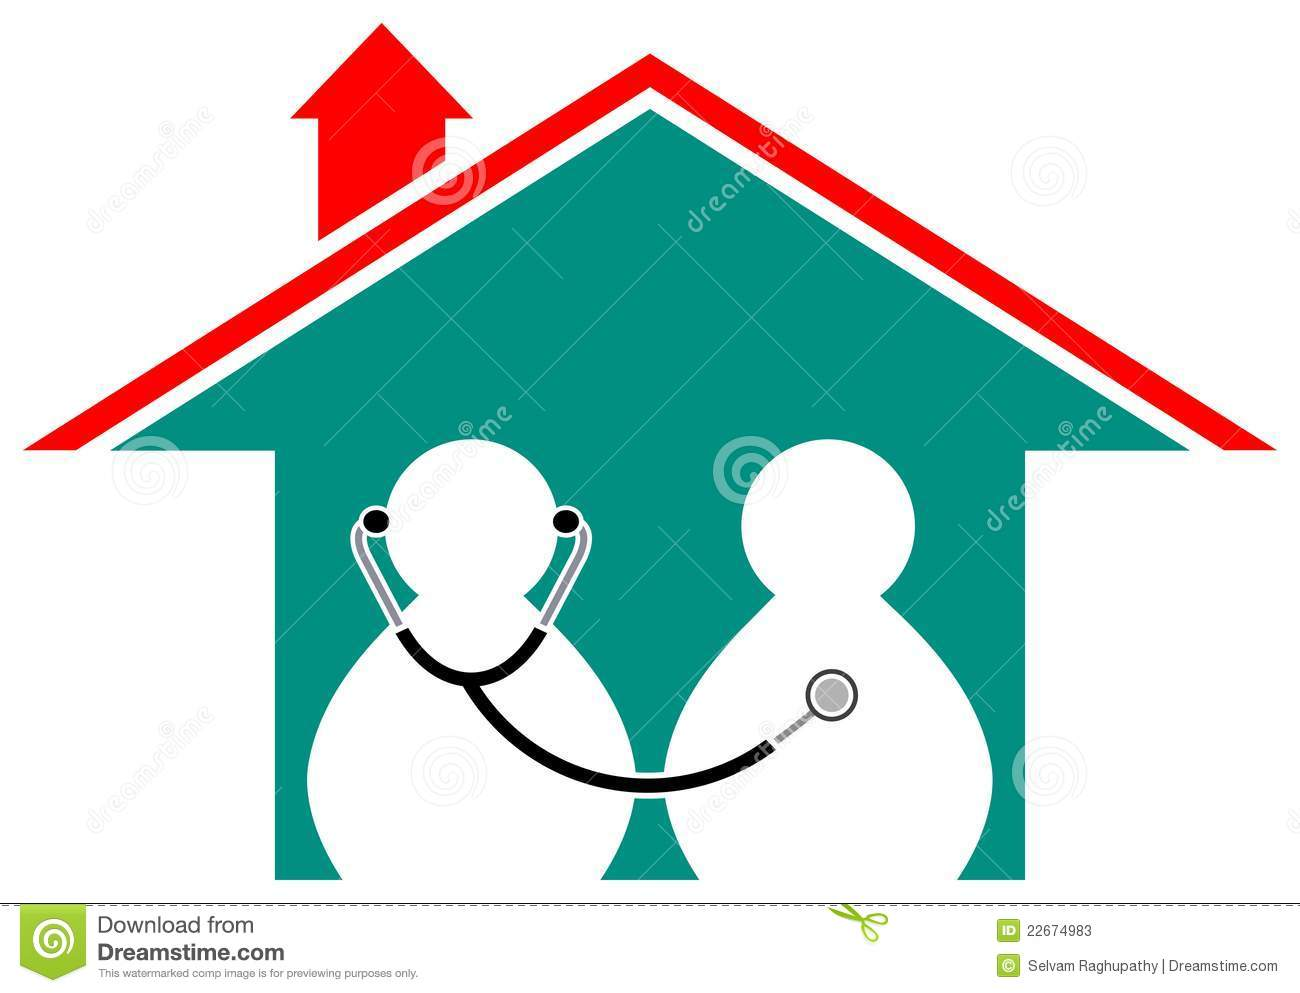 Home Health Care Clipart - Clipart Kid